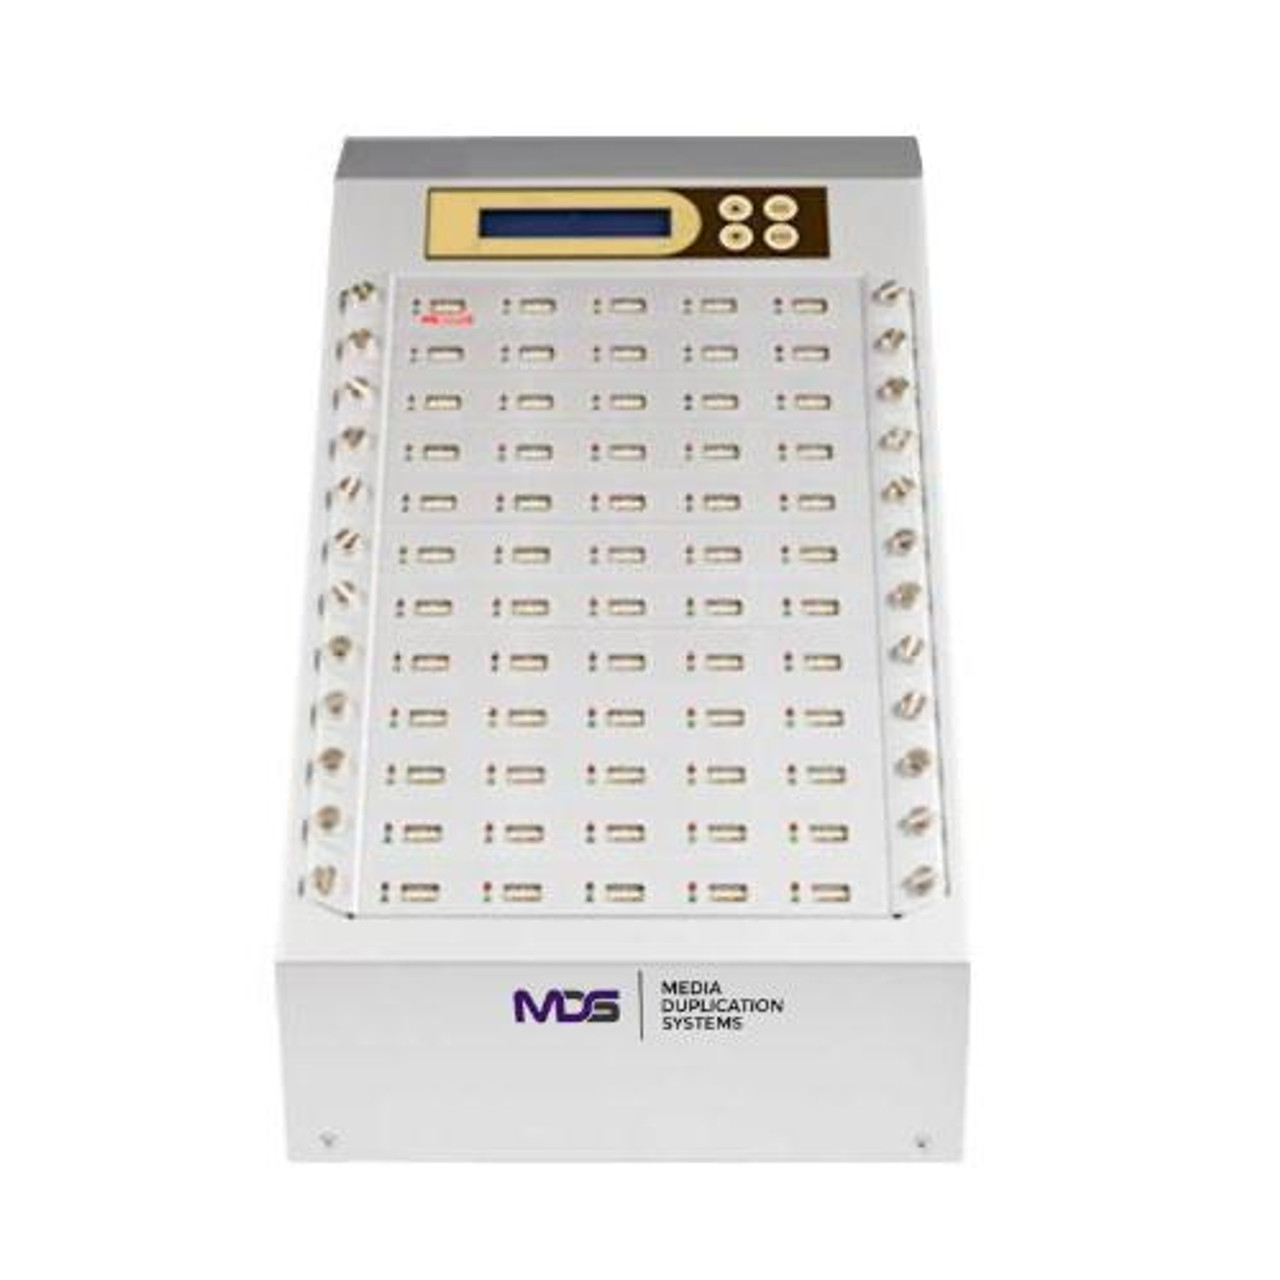 XpressHDD-Pro 1 to 59 External/Portable USB HDD/SSD Duplicator